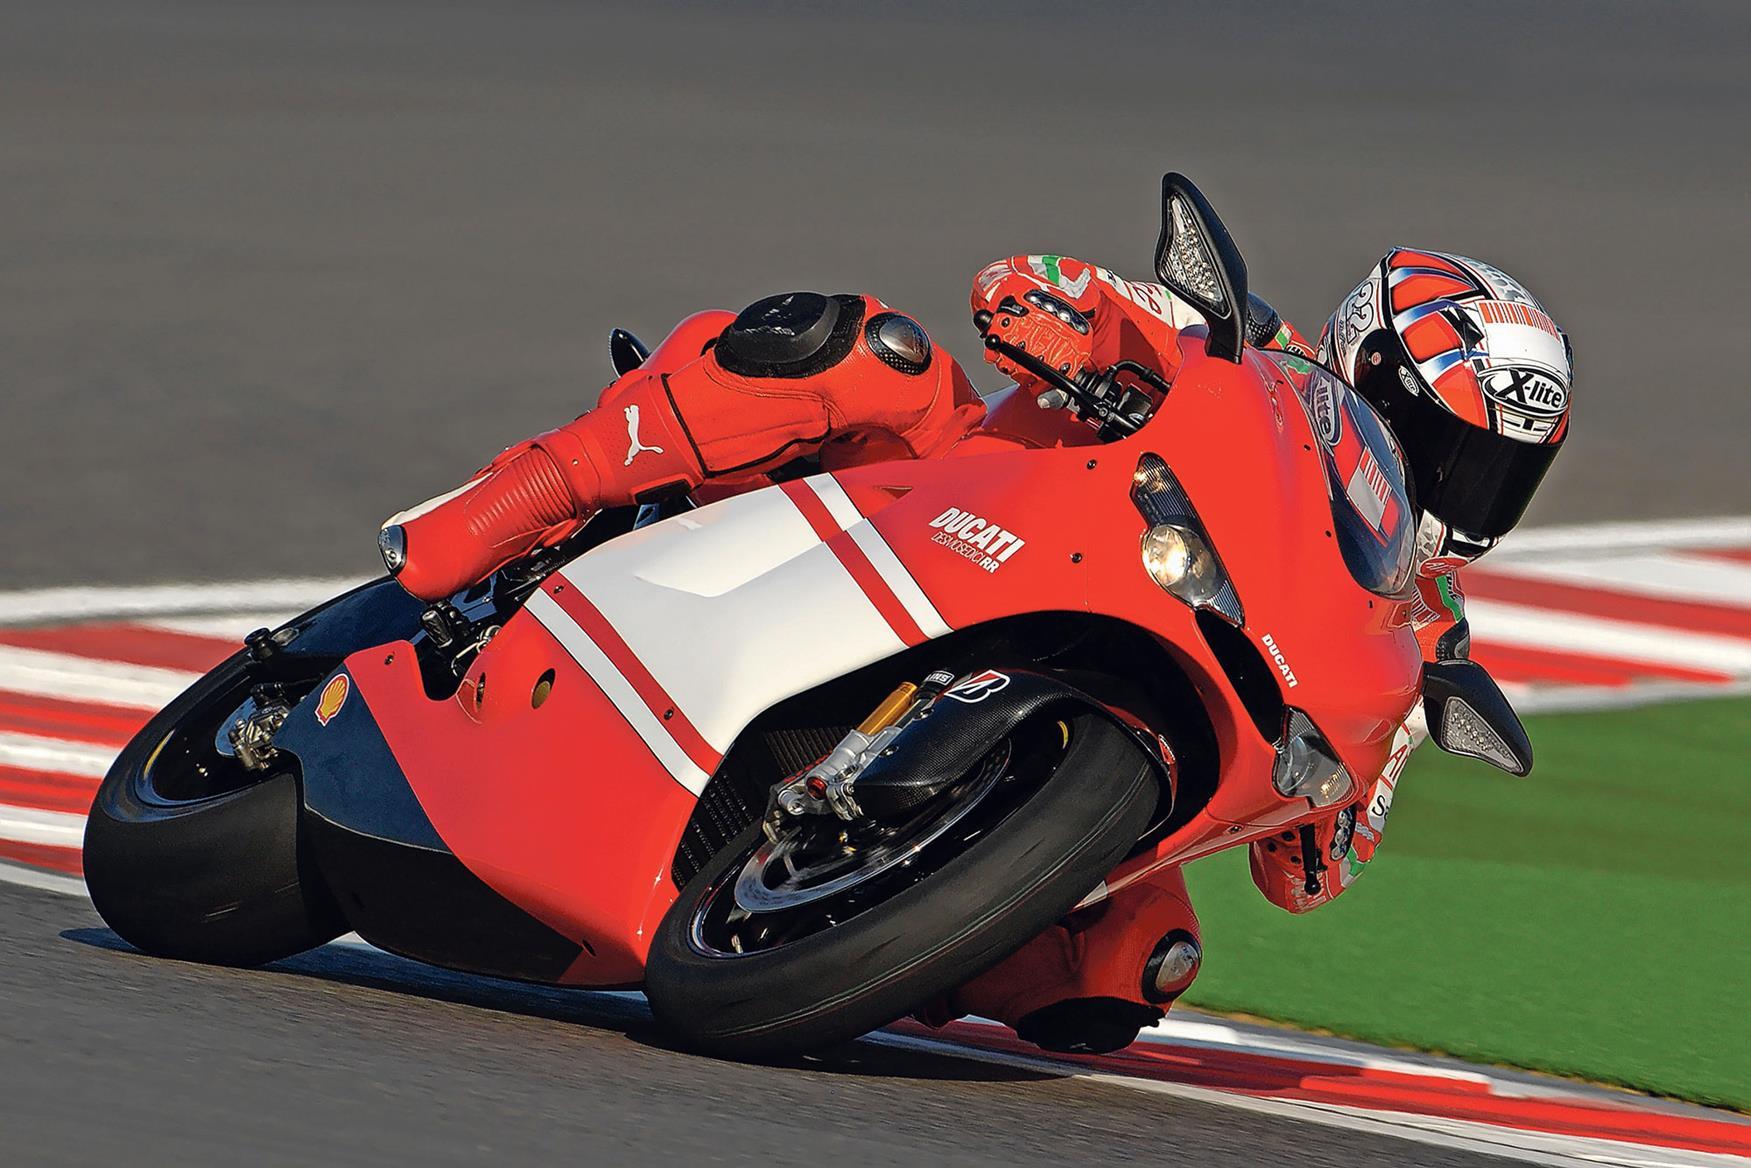 Ducati launch the Desmosedici D16 RR